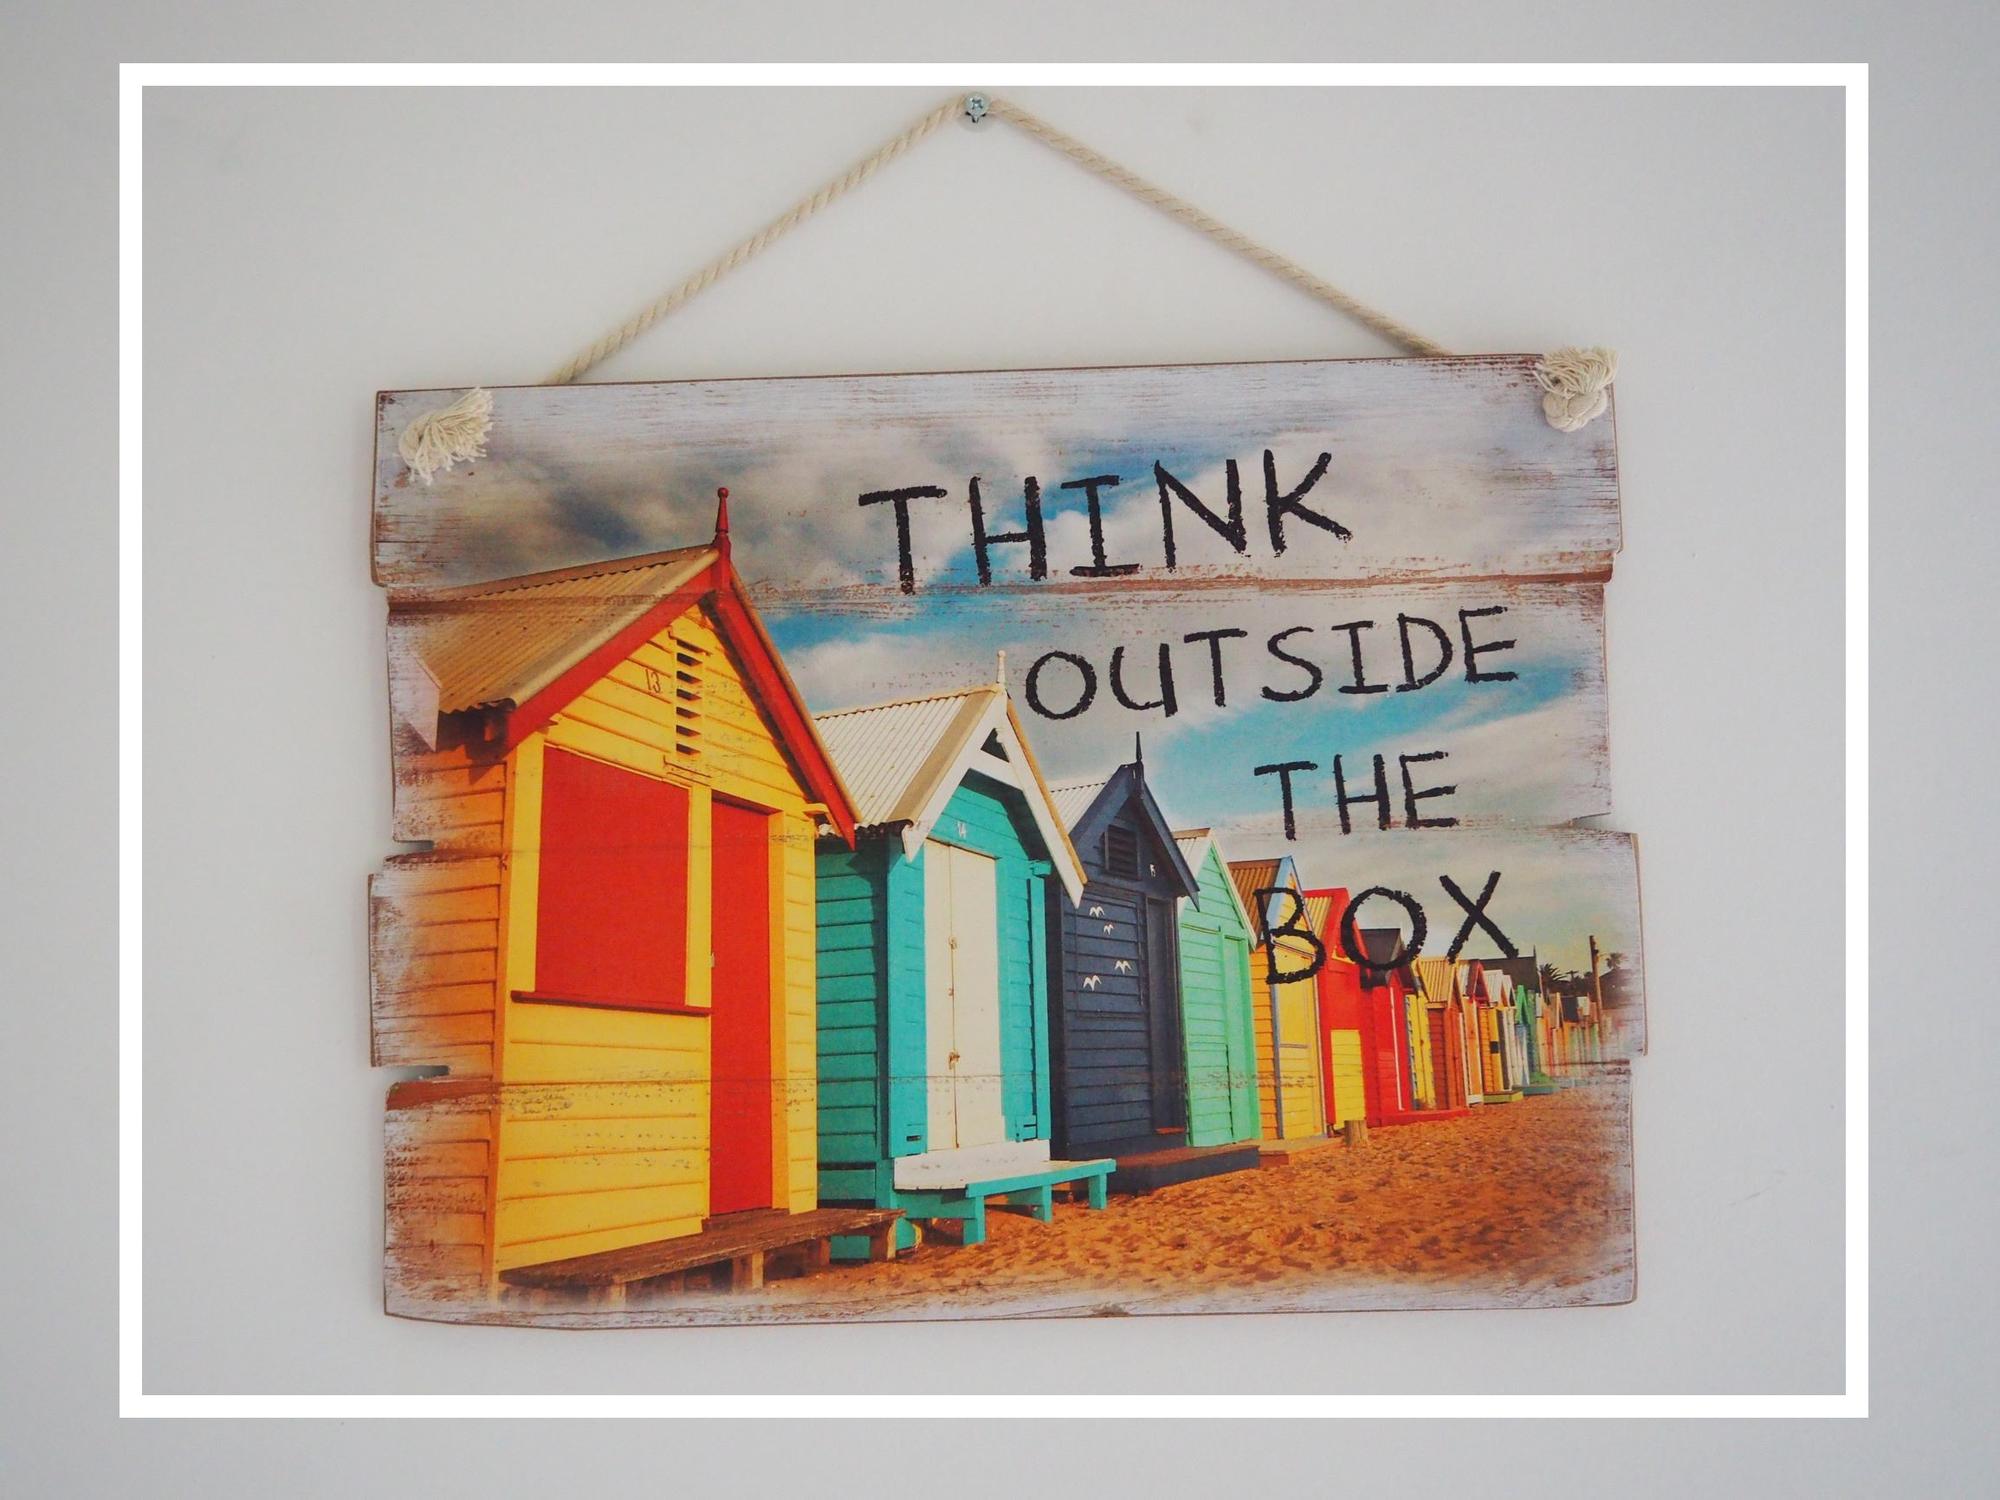 Think outside the box – das Abenteuer zu Leben